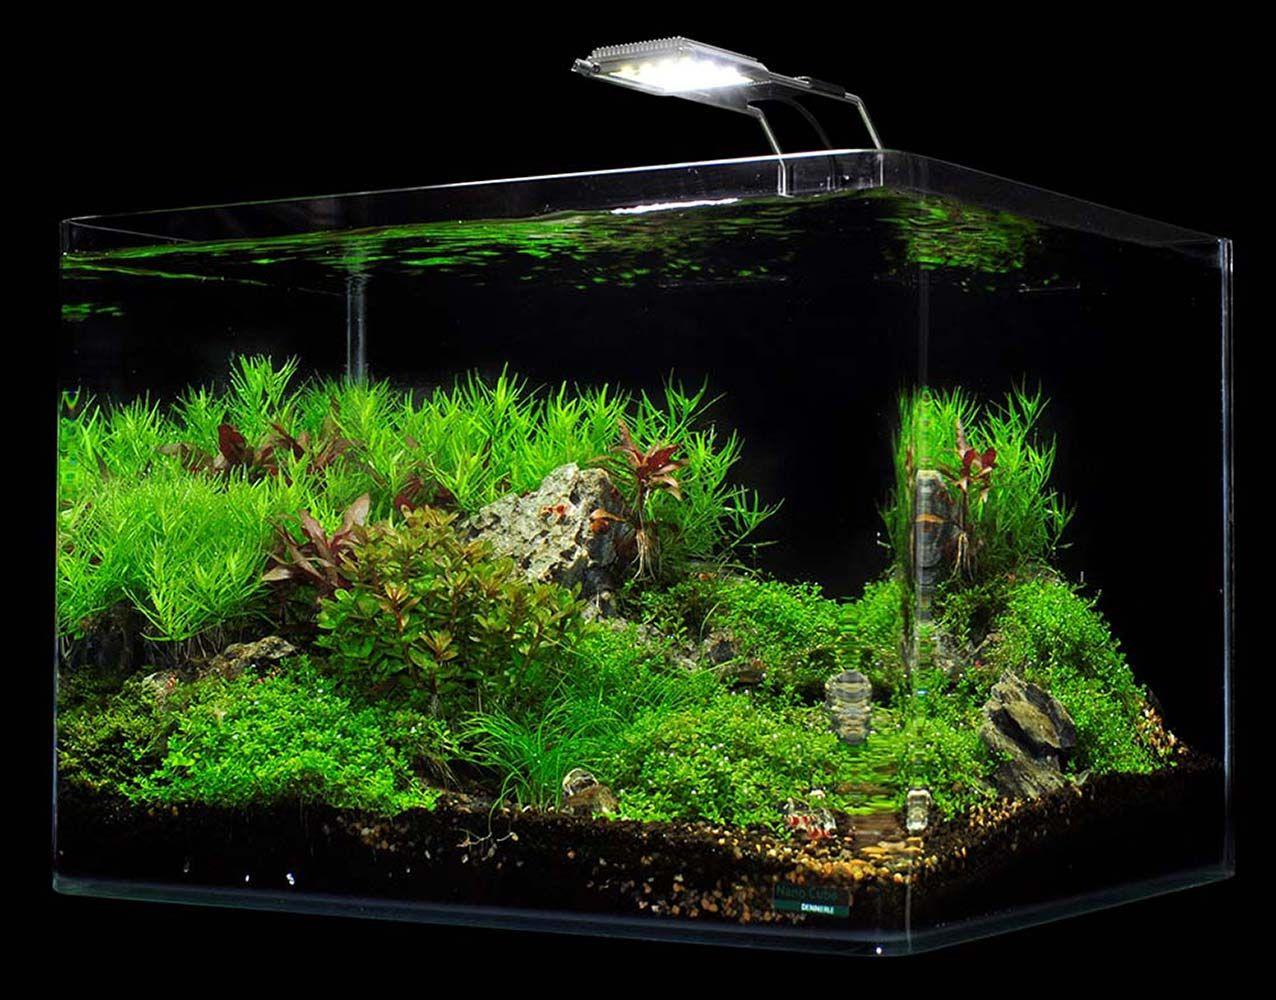 Dennerle Scapers Tank 10 Gallon Aquarium Kit With Led Light Fixture Fish Tank Plants Planted Aquarium Amazing Aquariums